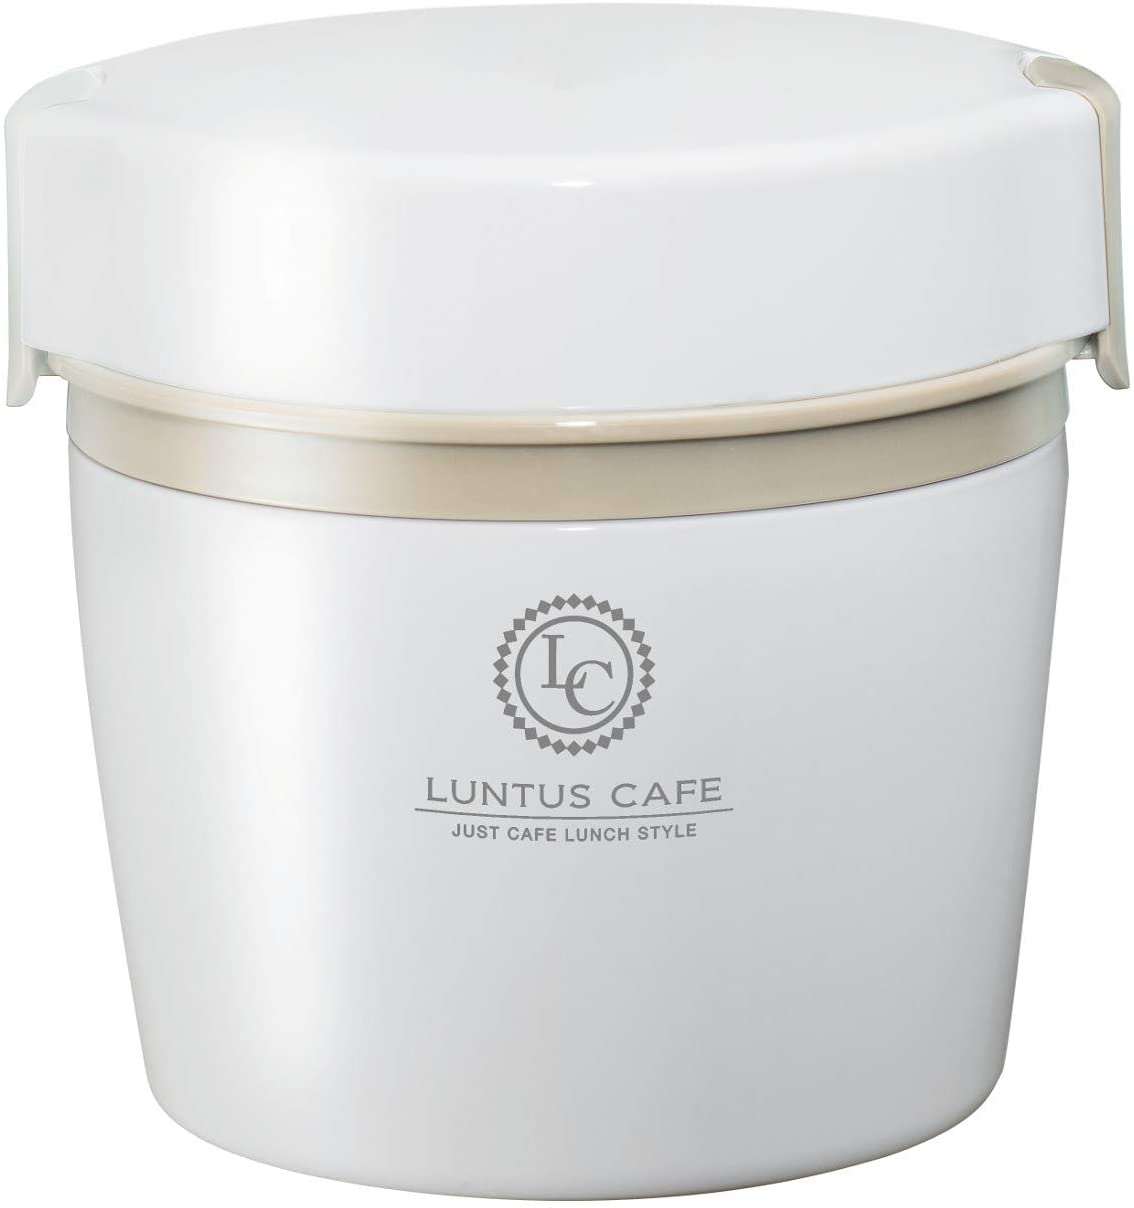 ASVEL(アスベル) 保温弁当箱 ランタス カフェ丼 HLB-CD500の商品画像